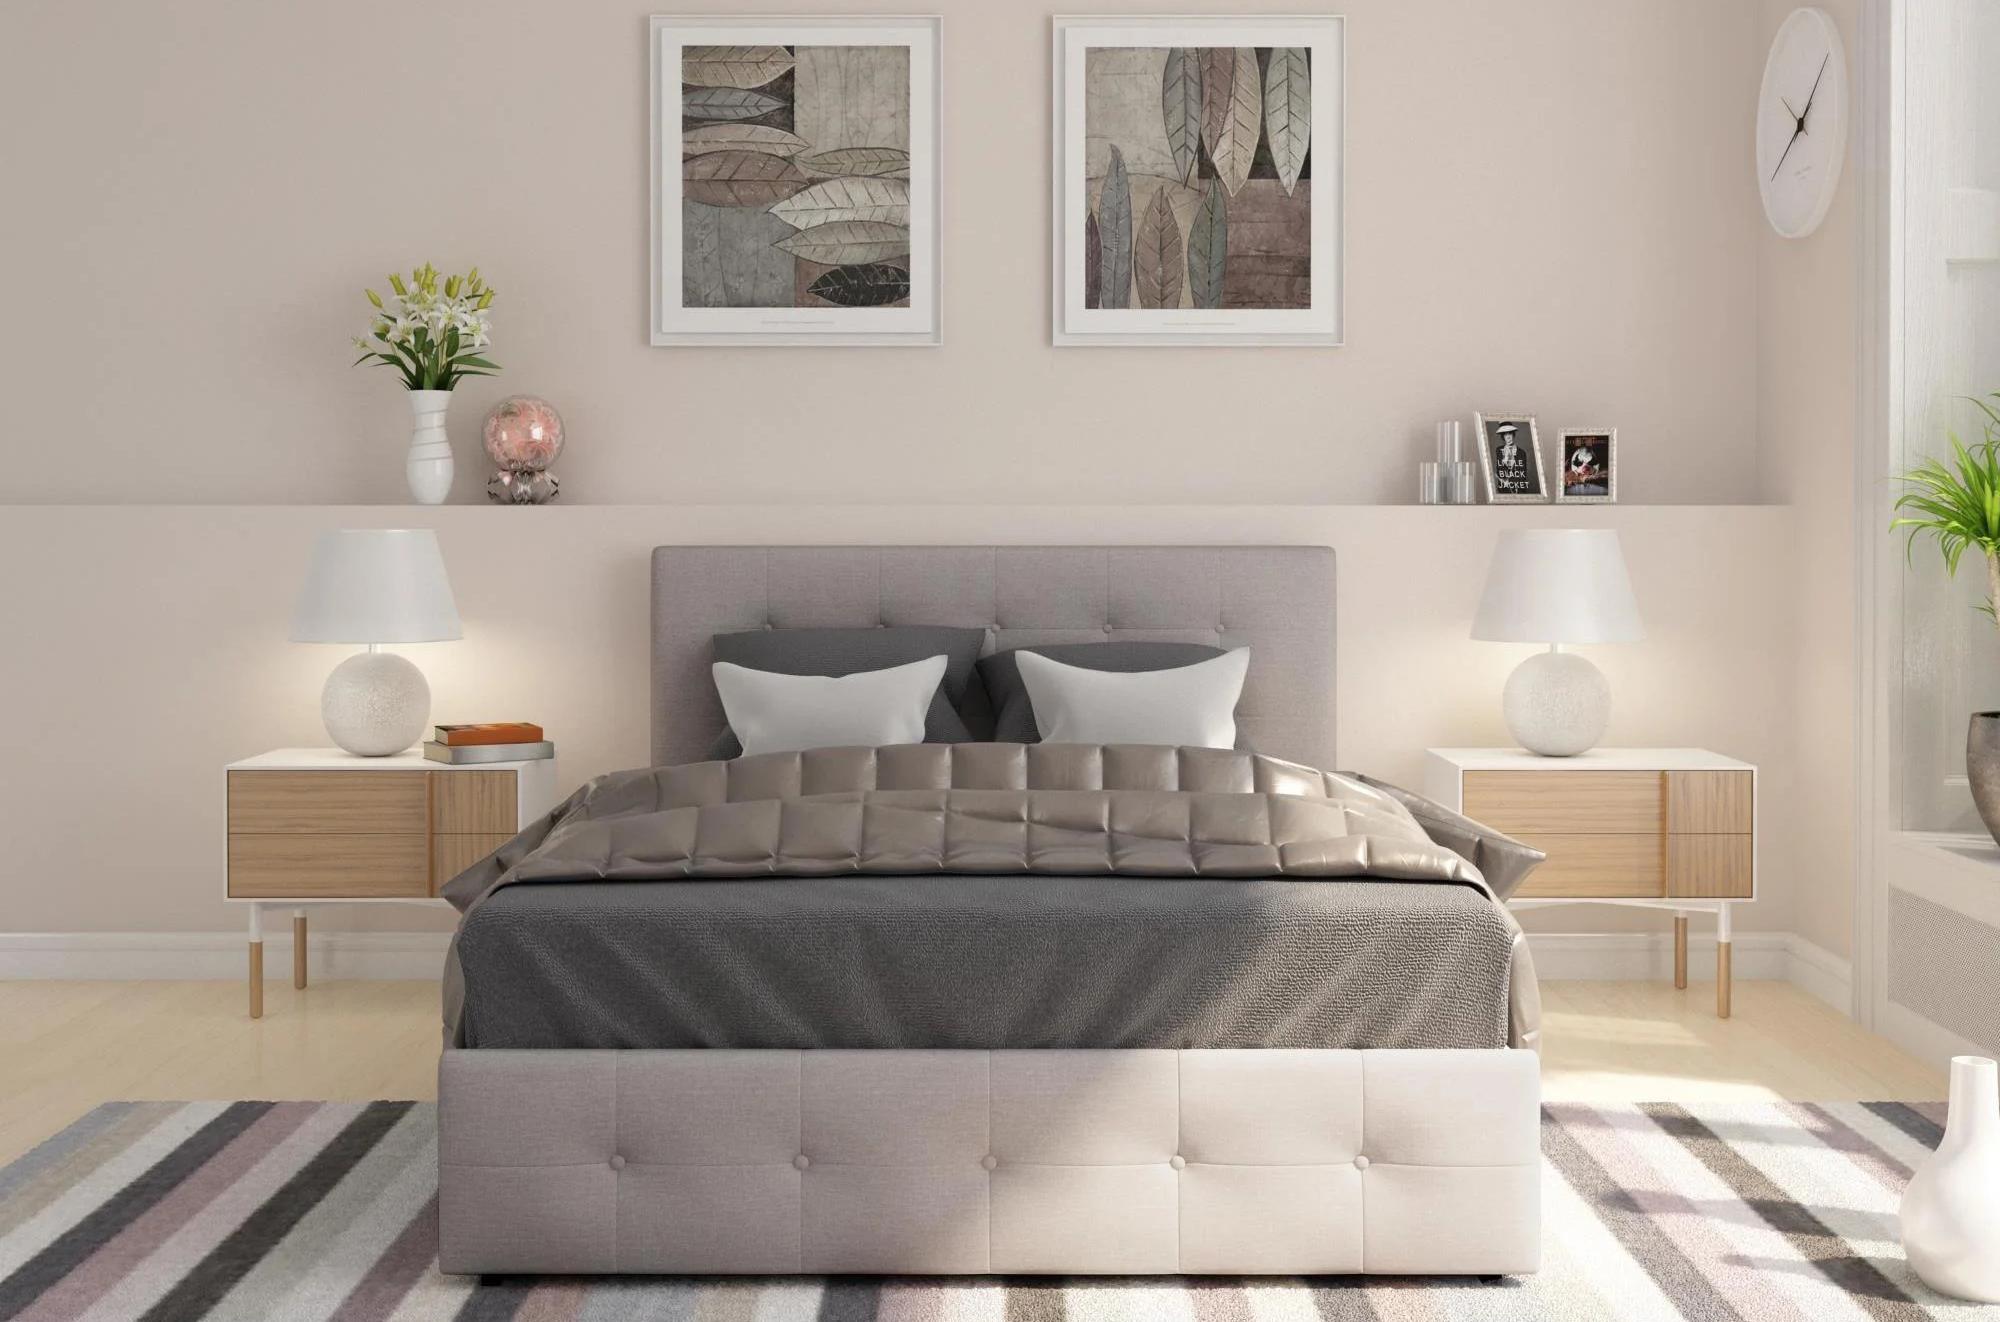 Korean Bedroom Furniture Tufted Upholstered Wood Bed WIth Drawer